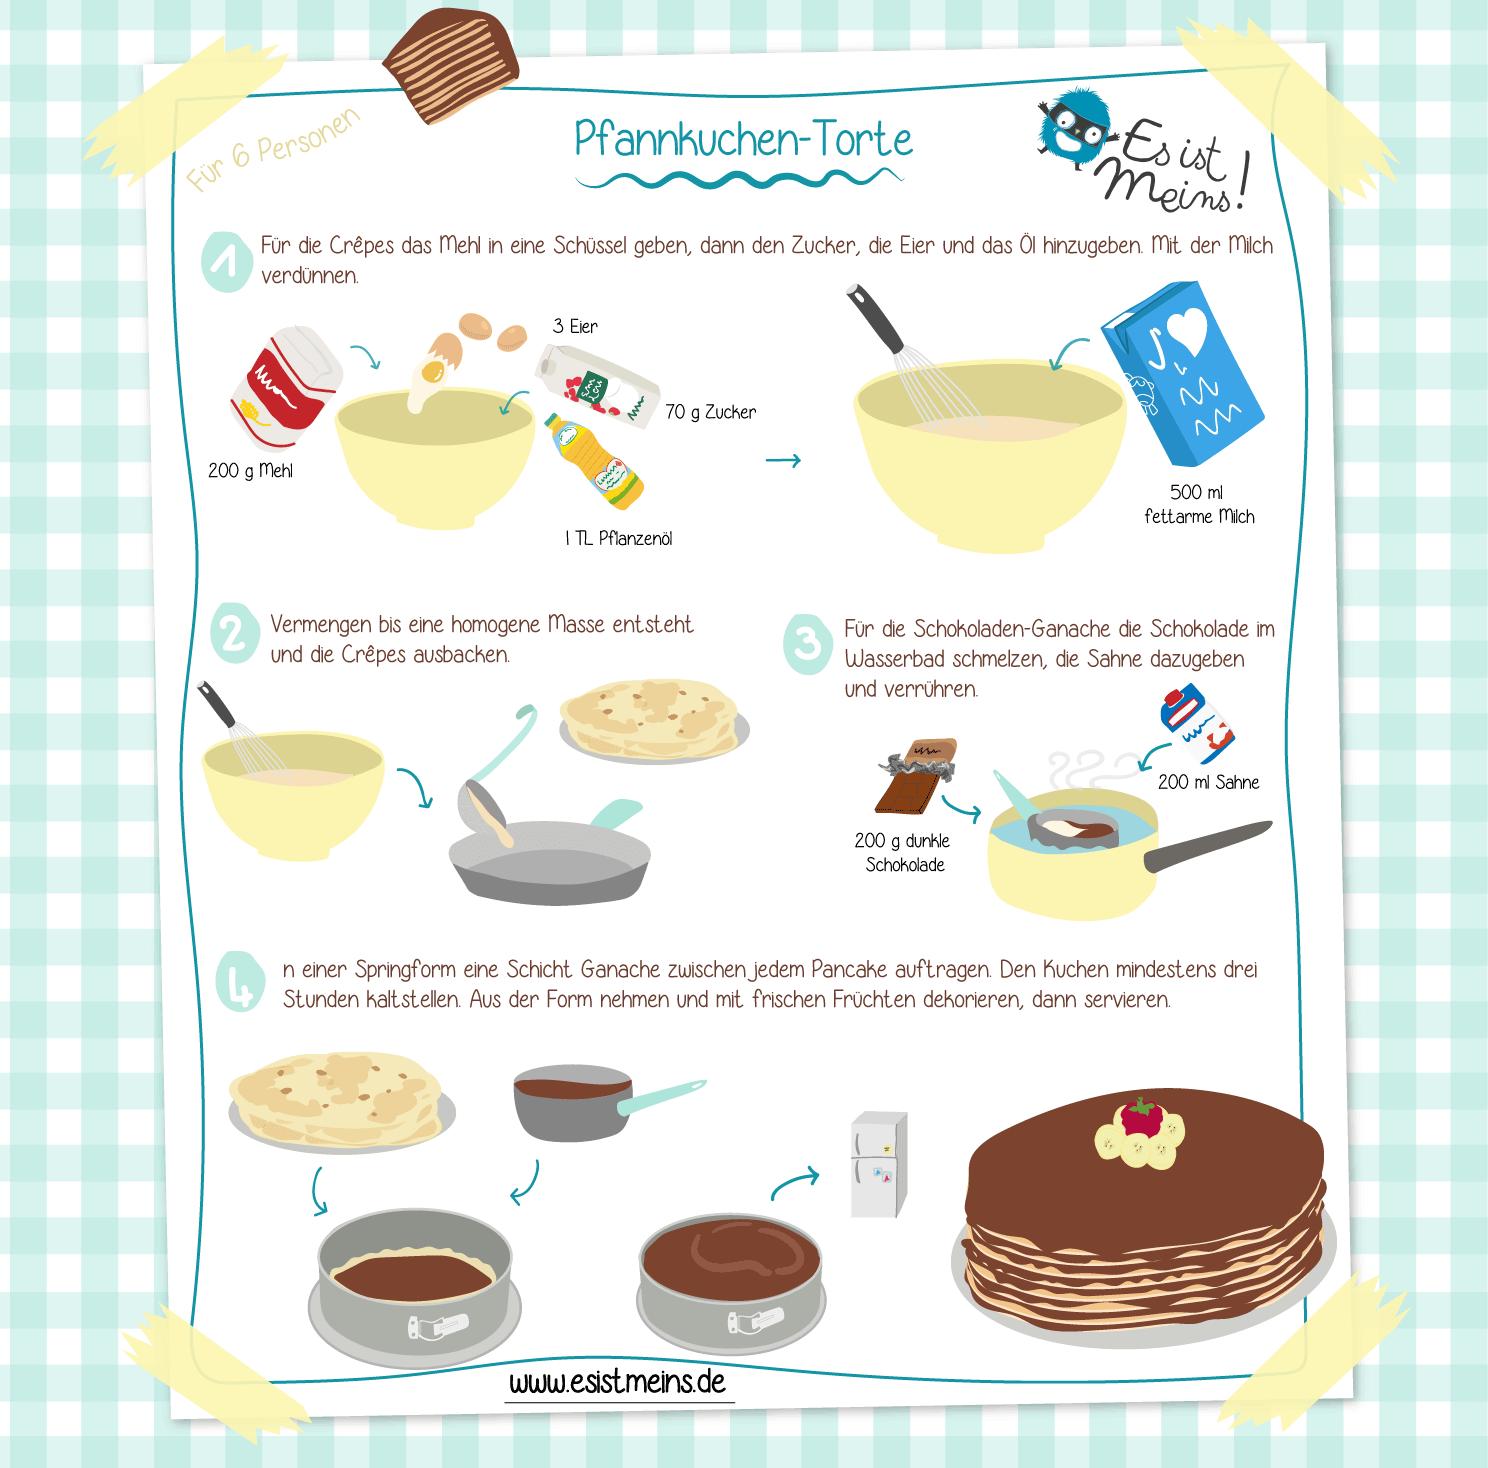 Pfannkuchen Torte Crepes Au Chocolat Recette